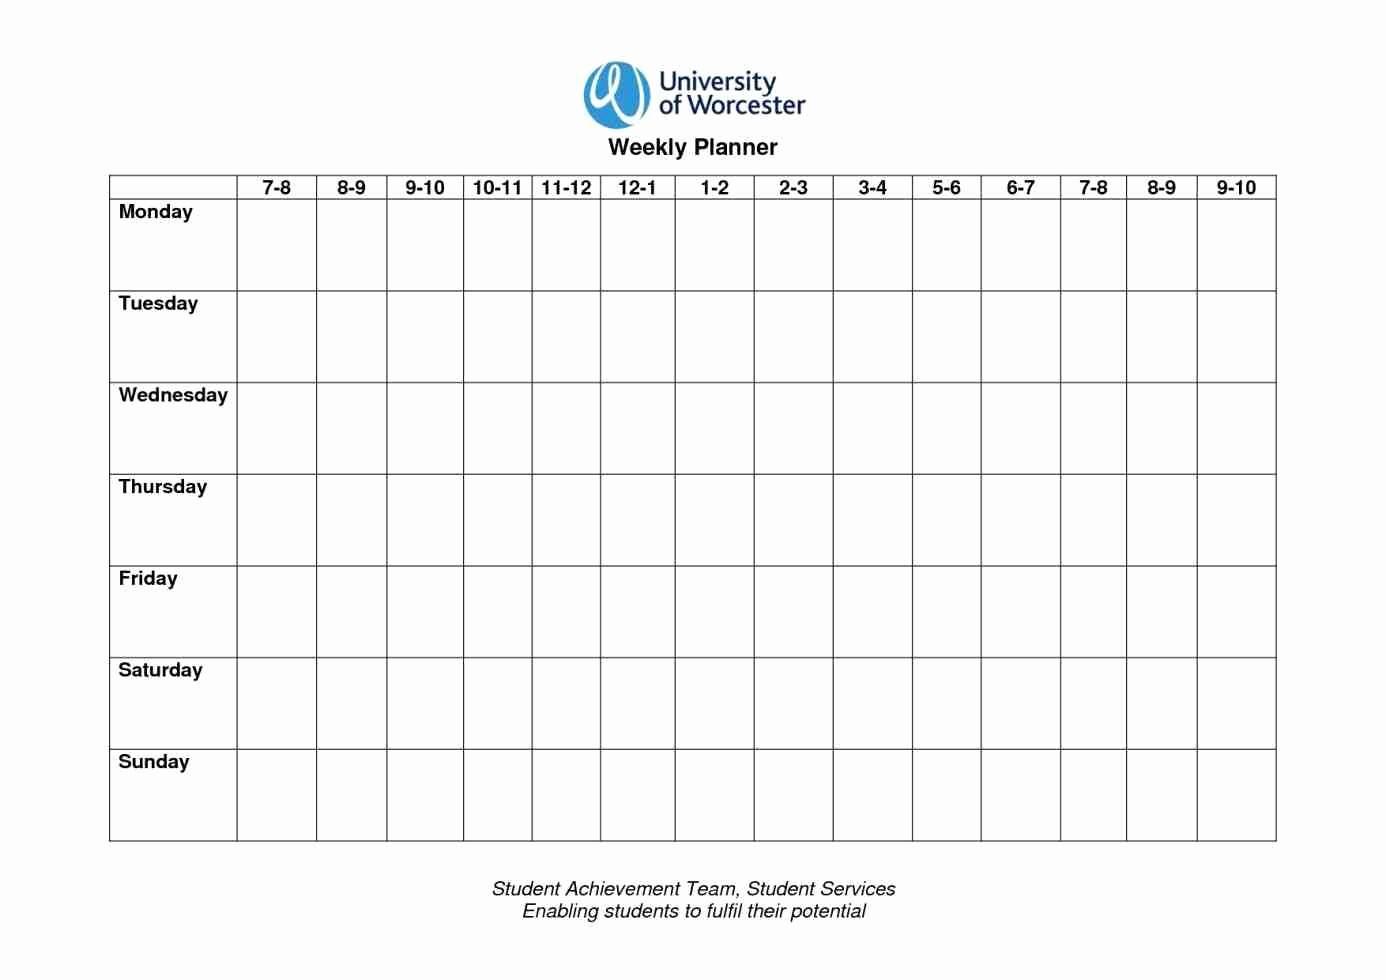 Monday to Sunday Calendar 2017 Fresh Monday Through Sunday Calendar